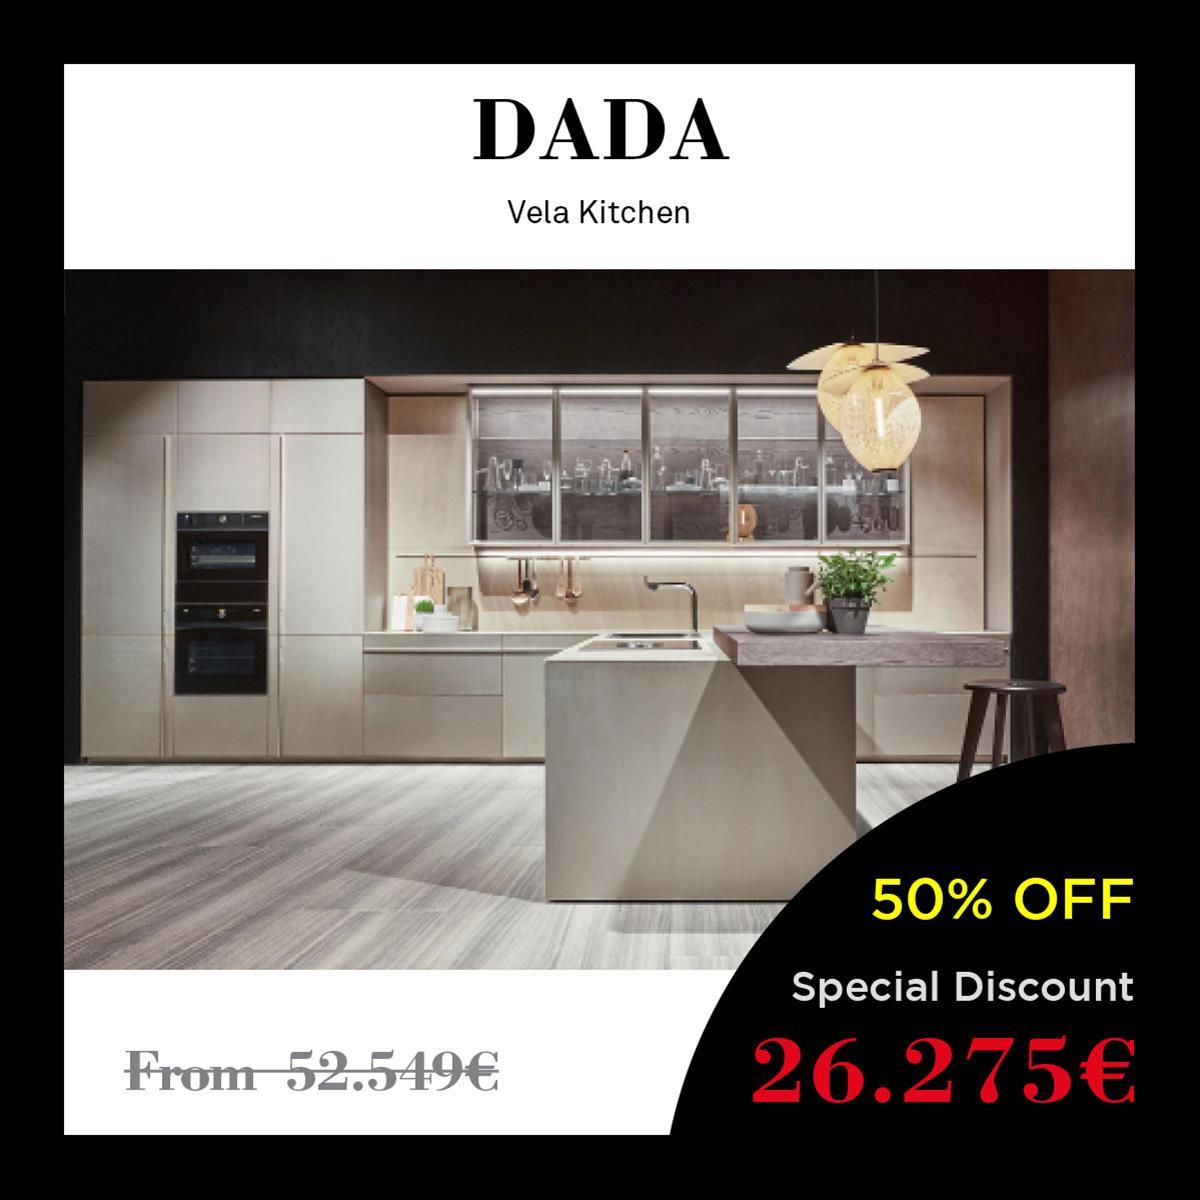 Dada Kitchen Outlet Prices At 50 Dada Milano